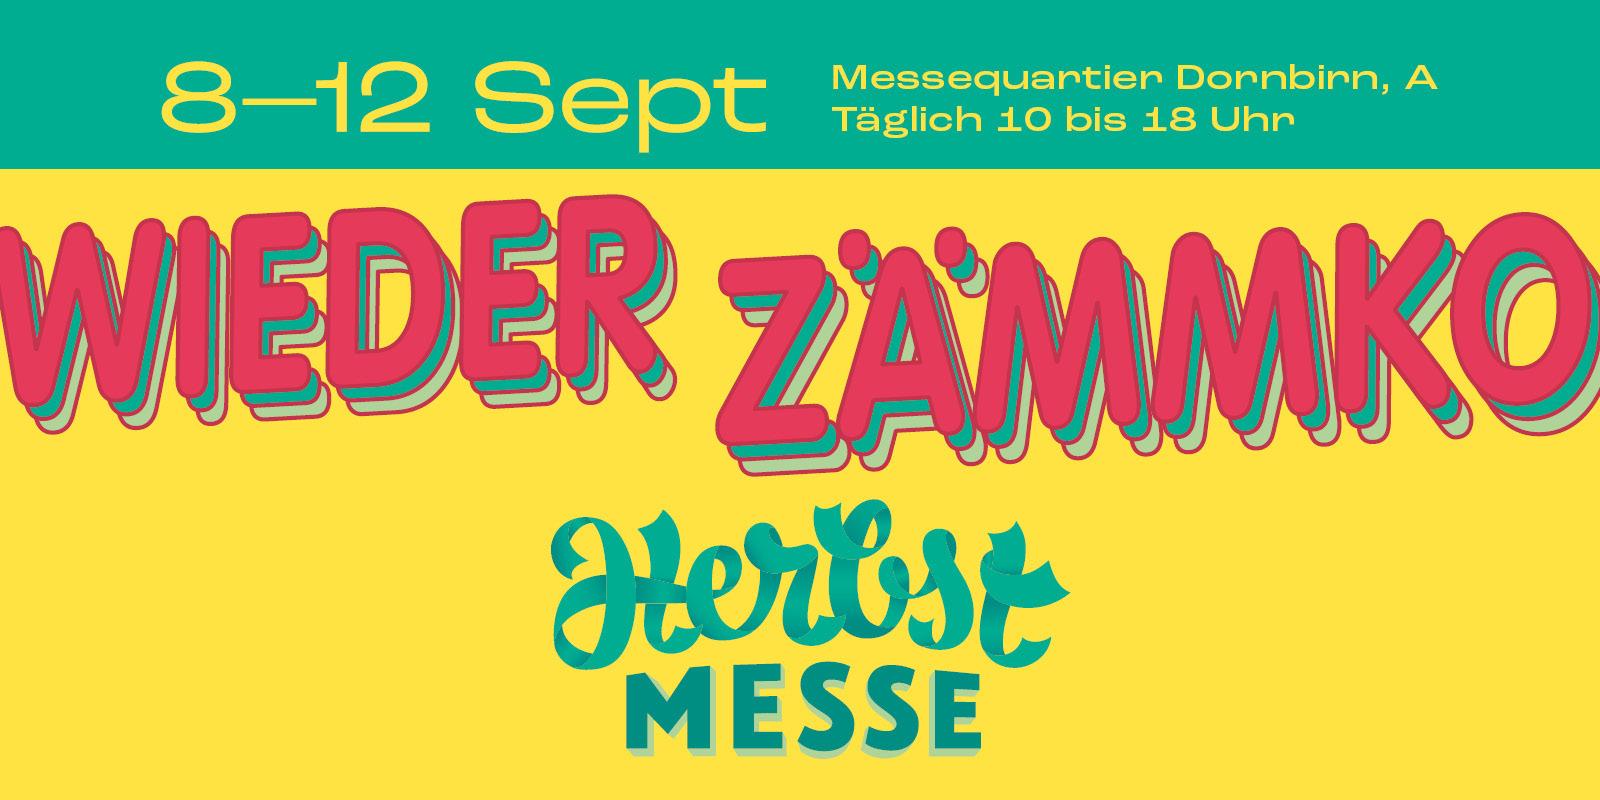 Banner der Dornbirner Herbstmesse